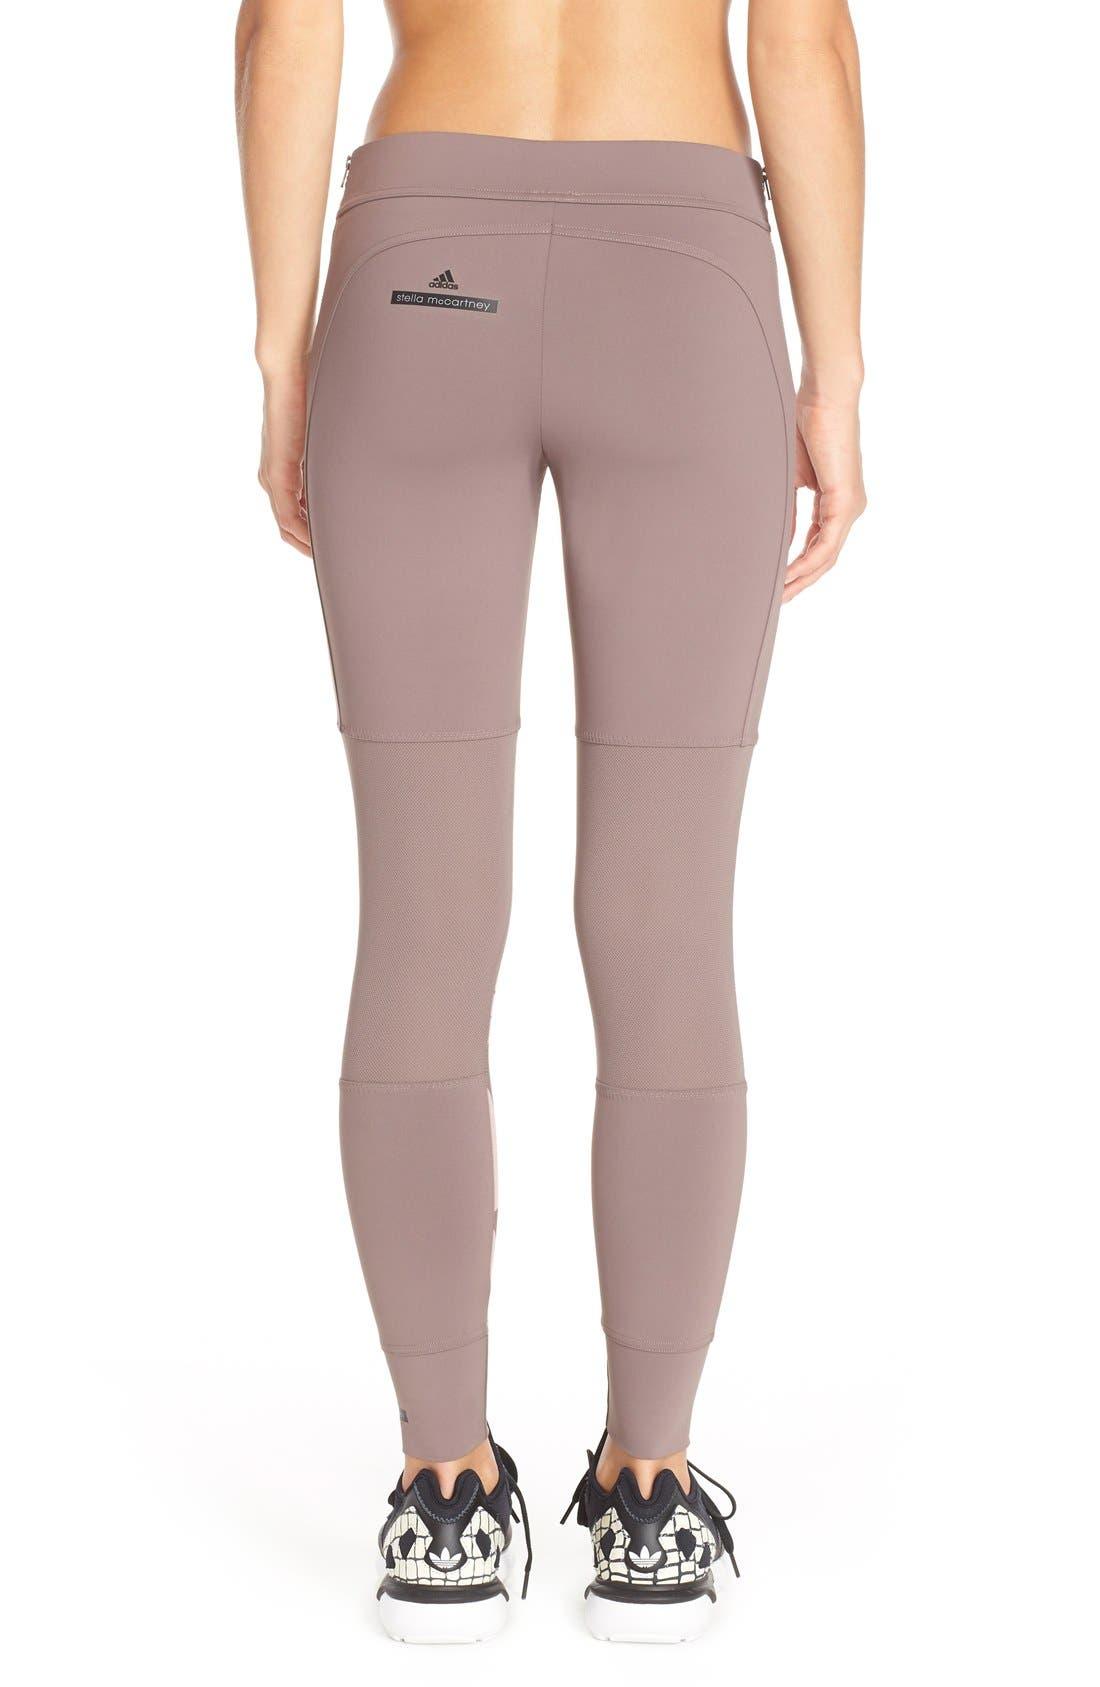 Alternate Image 2  - adidas by Stella McCartney 'Stu' Leggings